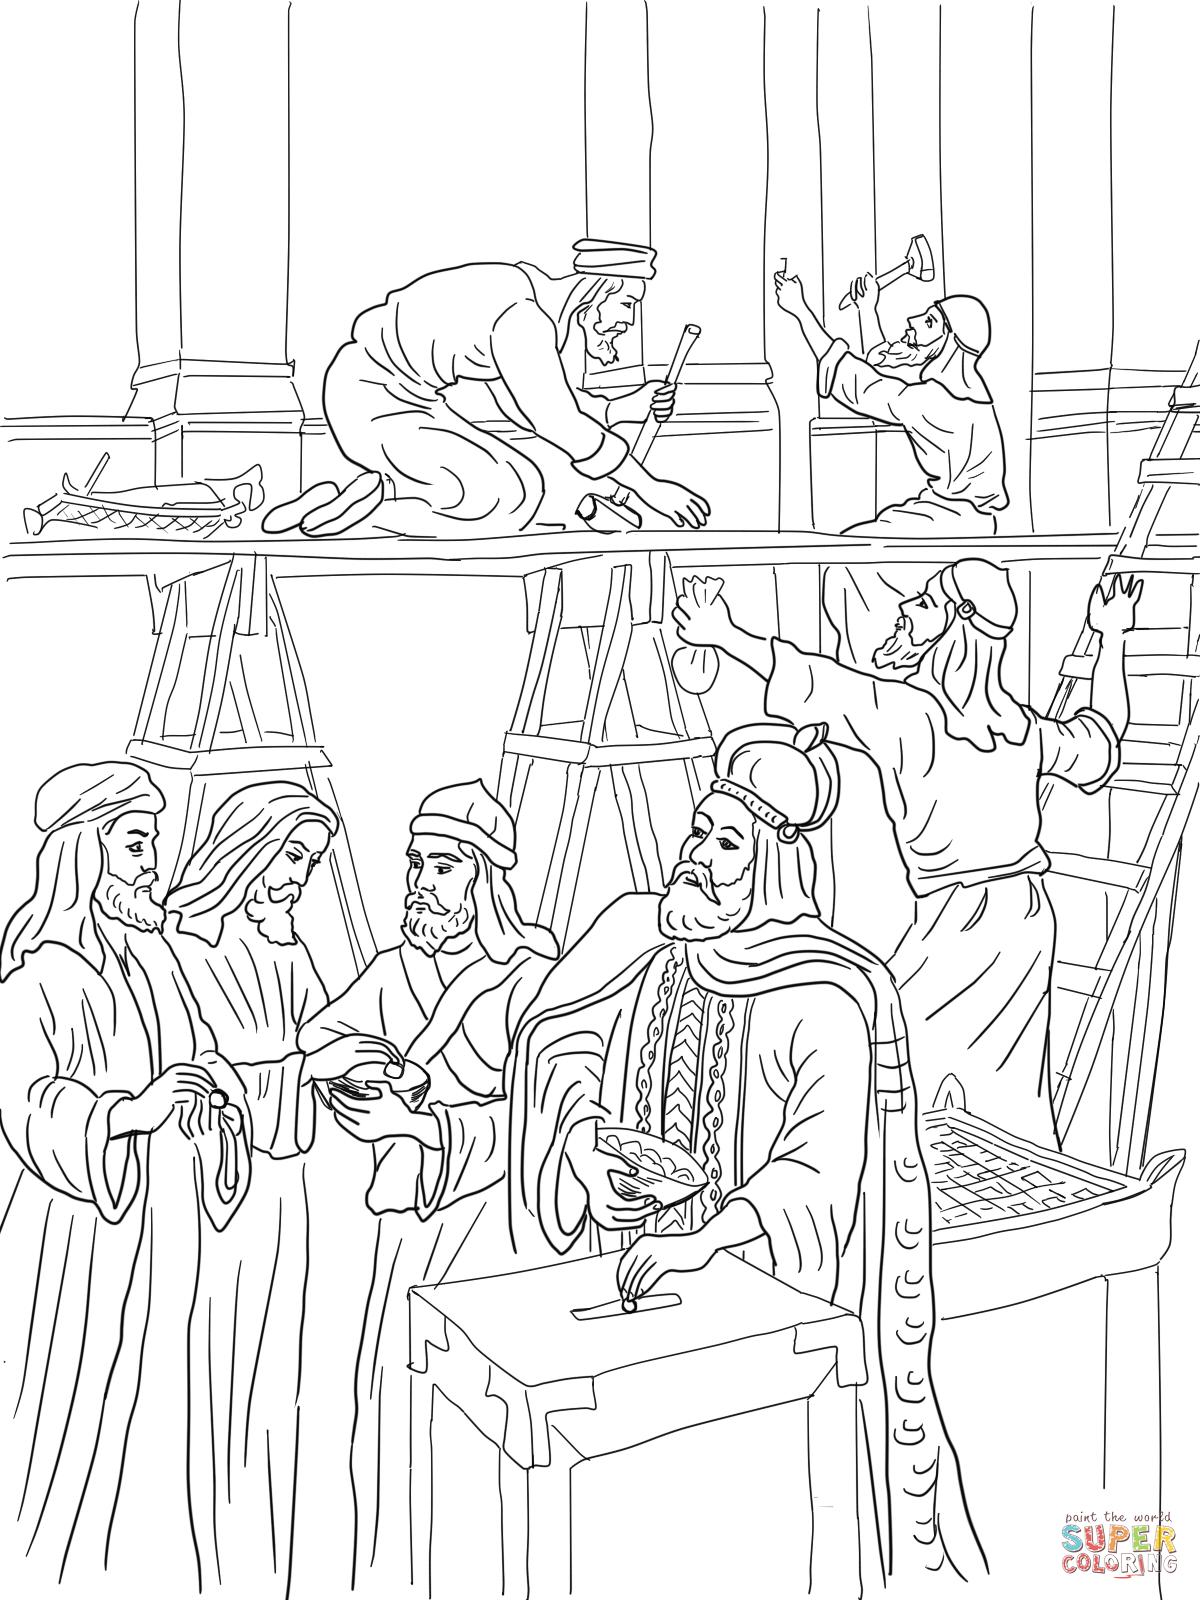 1200x1600 Best Of Coloring Pages Of King Josiah Fresh King Josiah Coloring